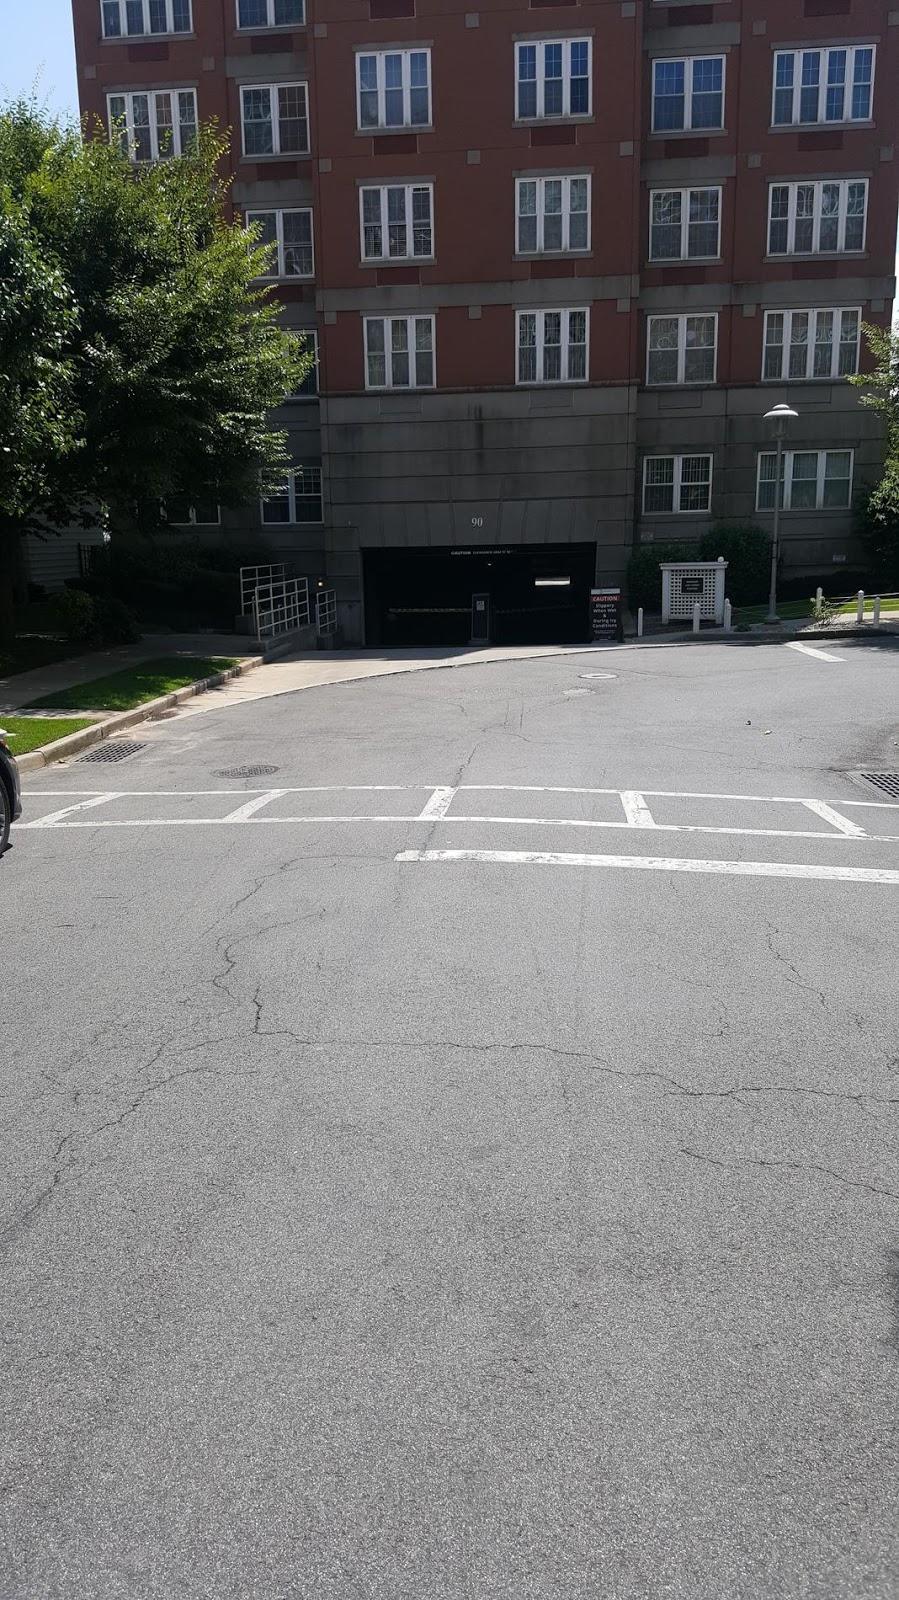 SP+ Parking - parking    Photo 1 of 4   Address: 90 Oceana Dr W, Brooklyn, NY 11235, USA   Phone: (212) 321-7500